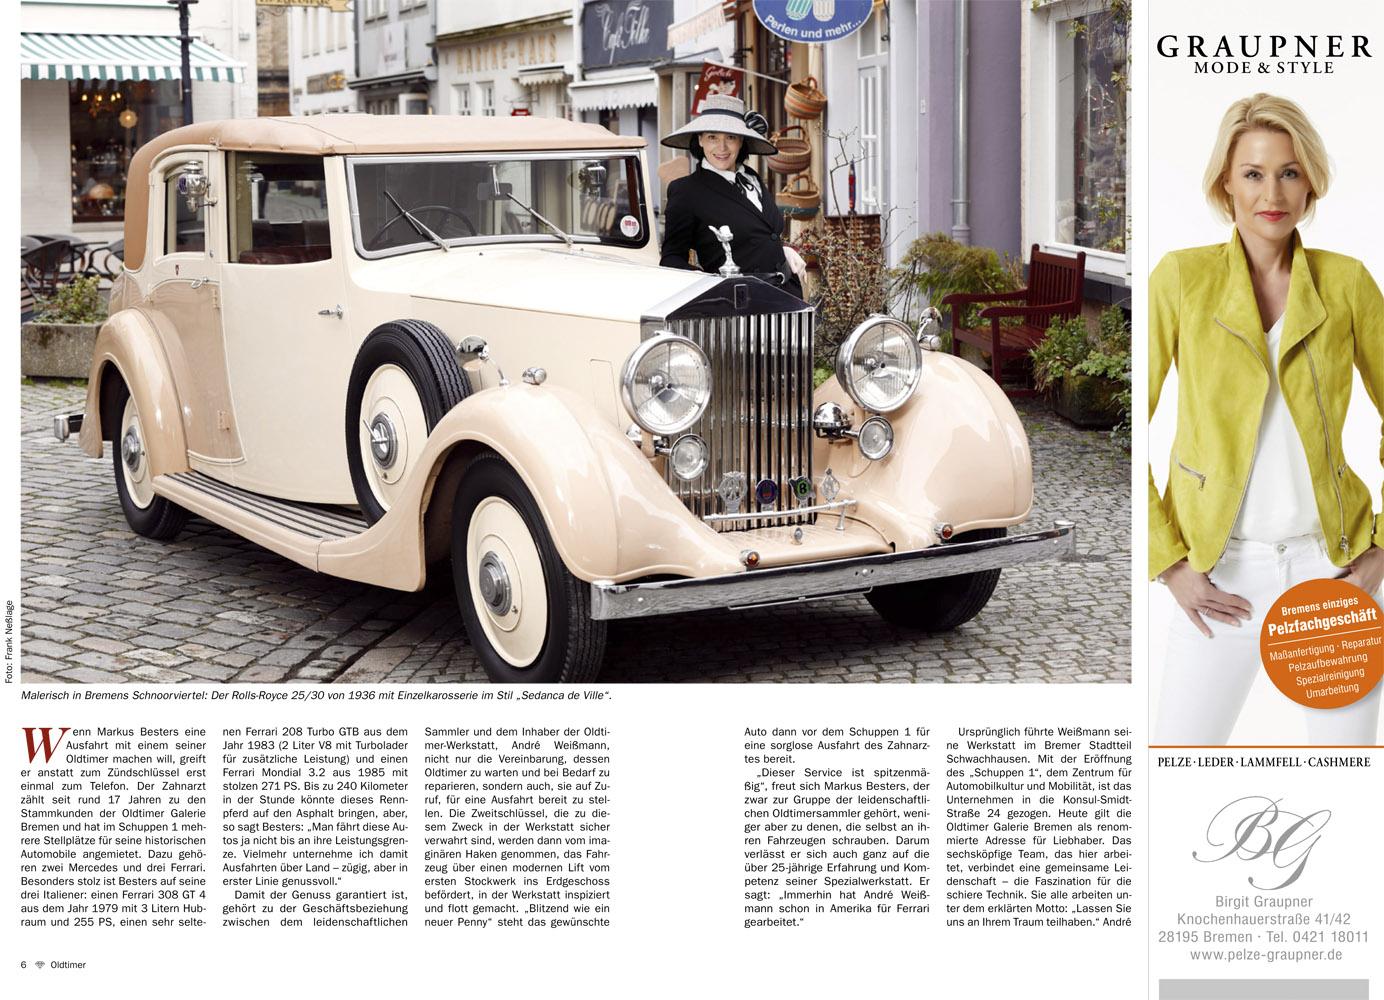 Sigrid Hirt vom Brillant Magazin